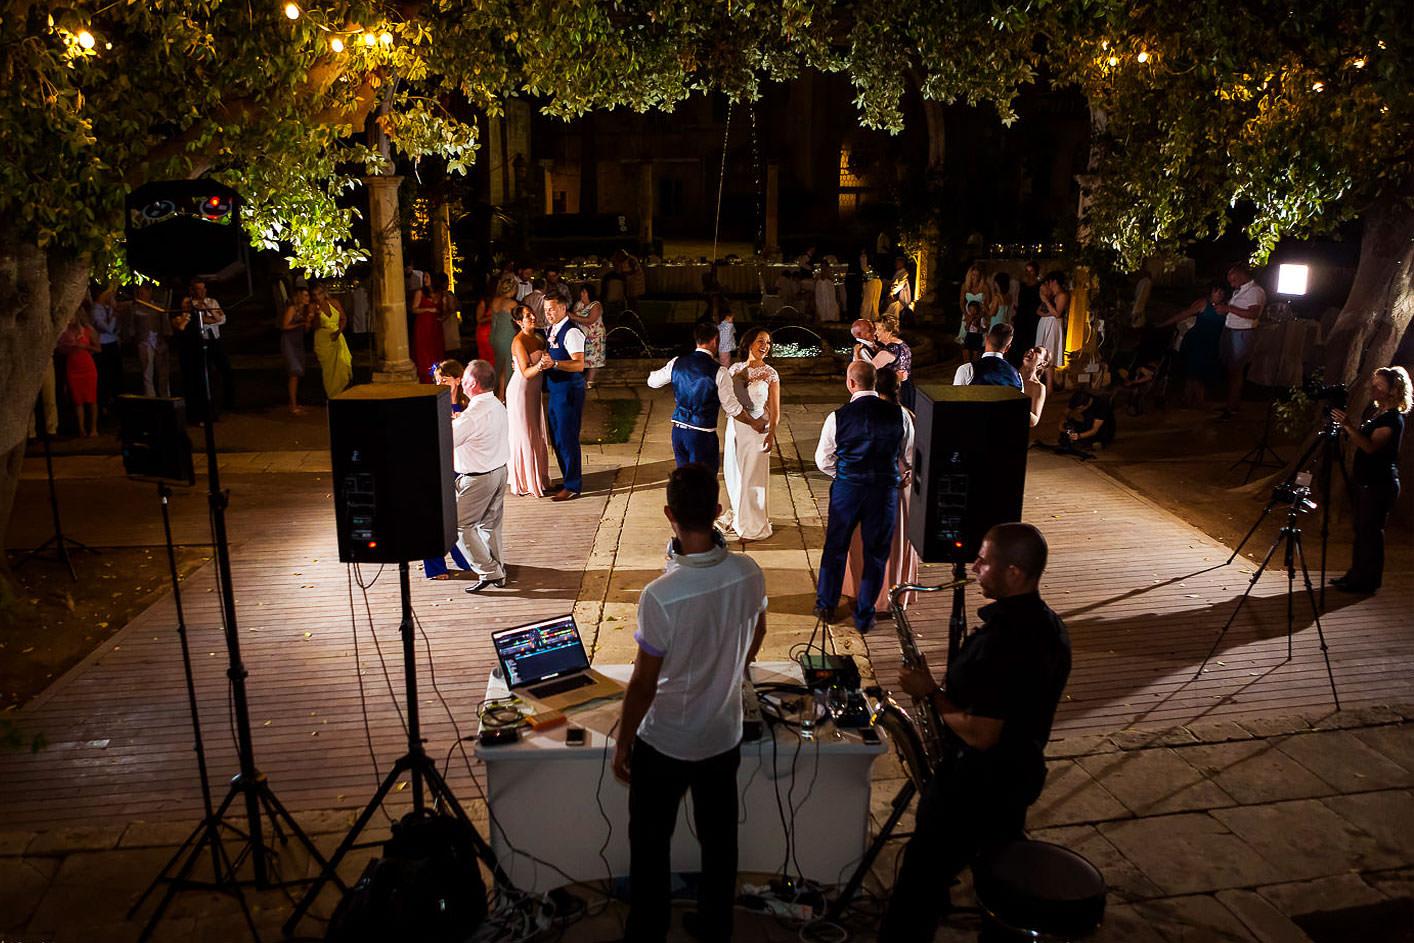 Wedding guests dancing in the gardens of Villa Bologna, Malta.